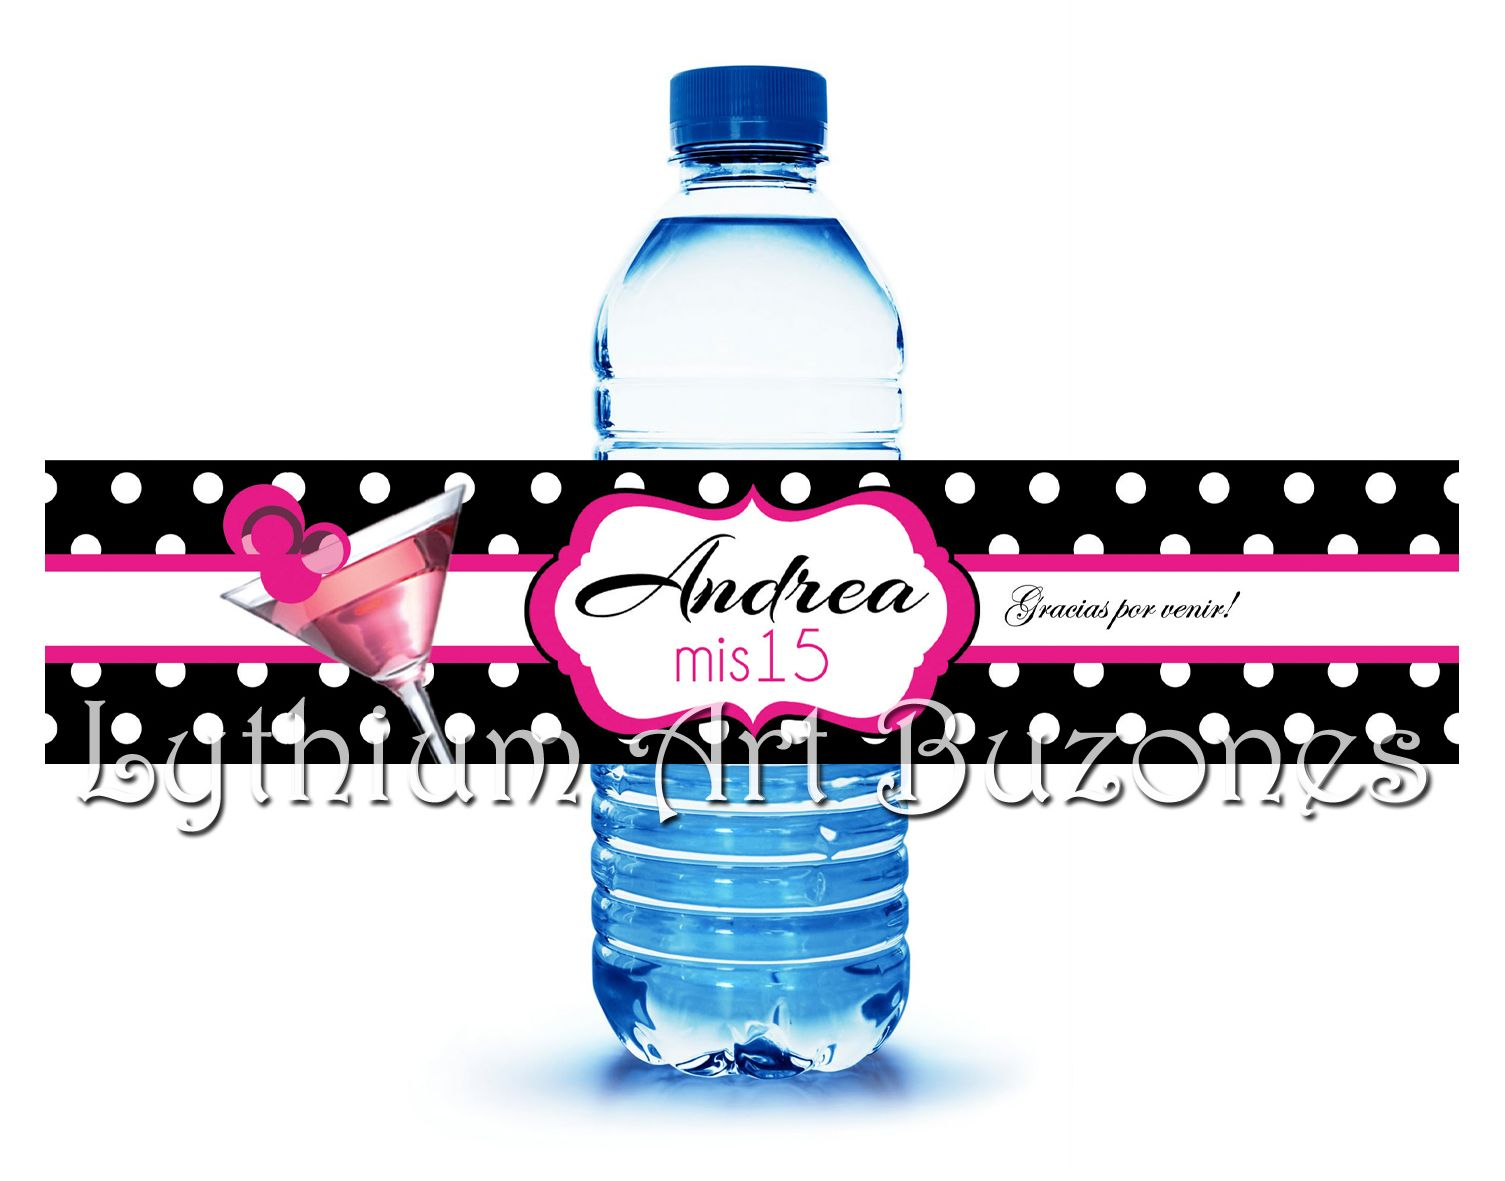 Imbécil Por Grabar  Etiquetas Personalizadas para botellas de agua